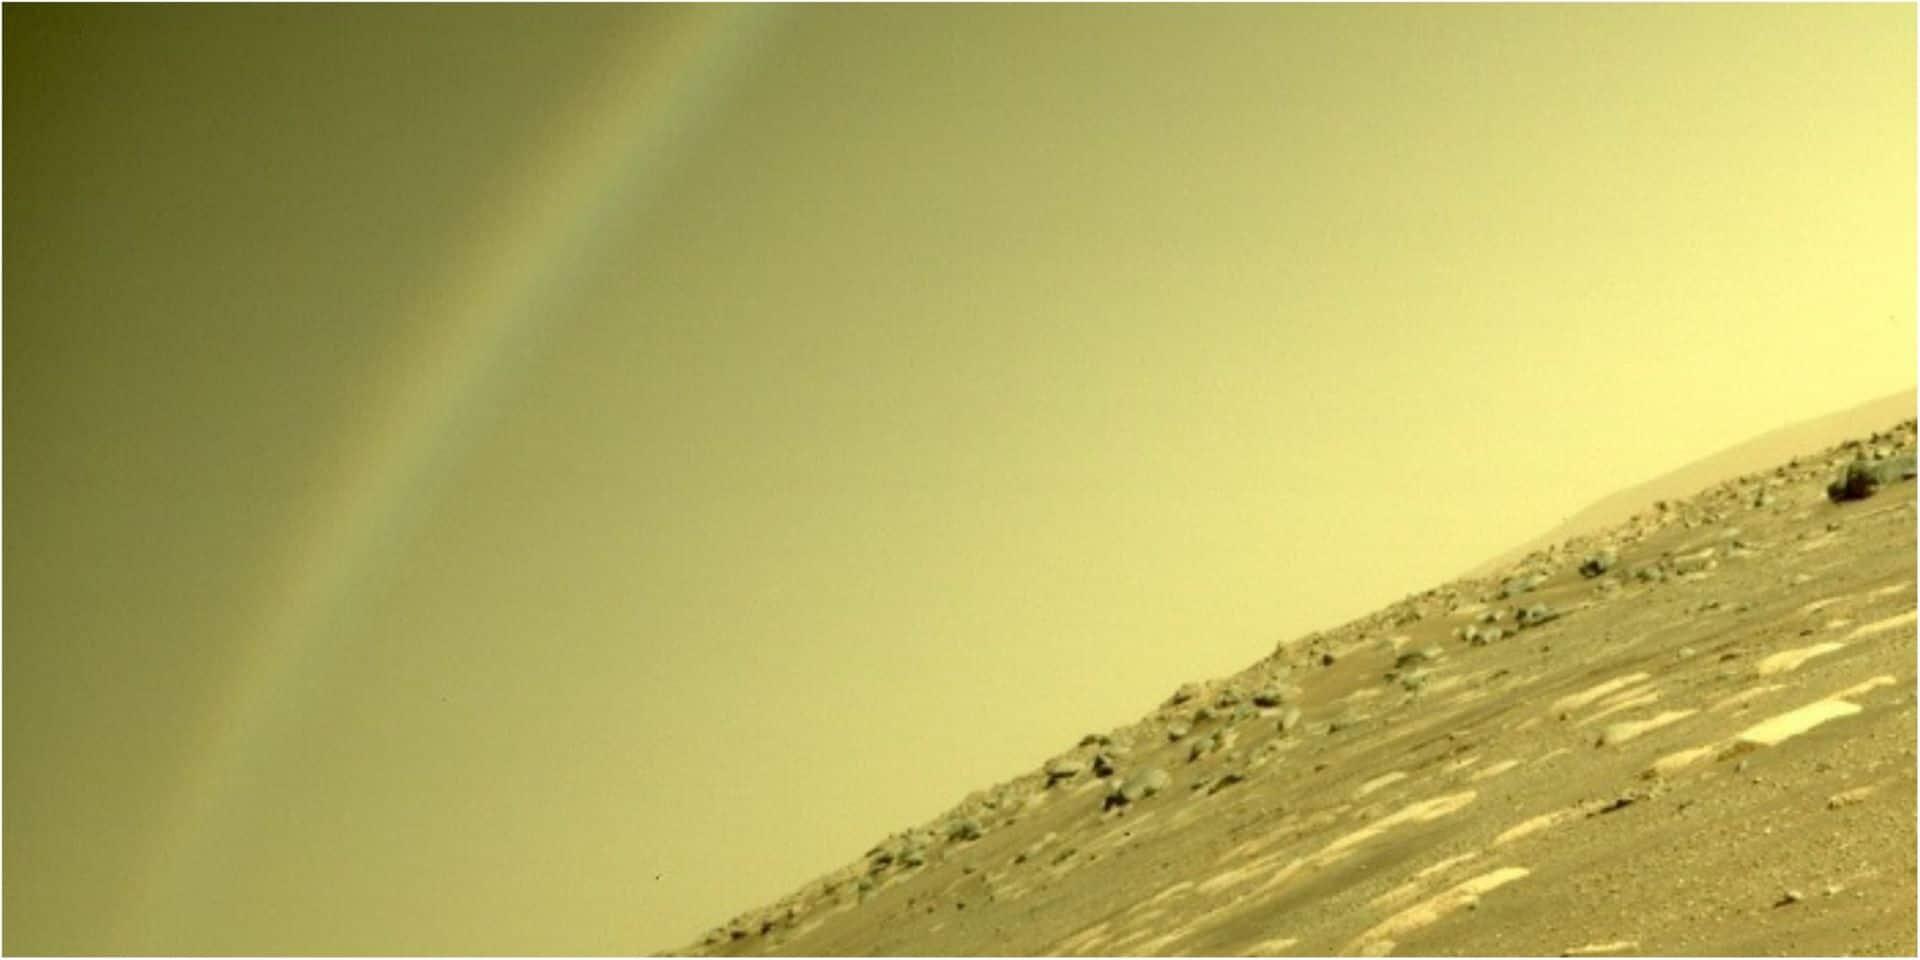 Un arc-en-ciel sur Mars ? La Nasa met les choses au clair